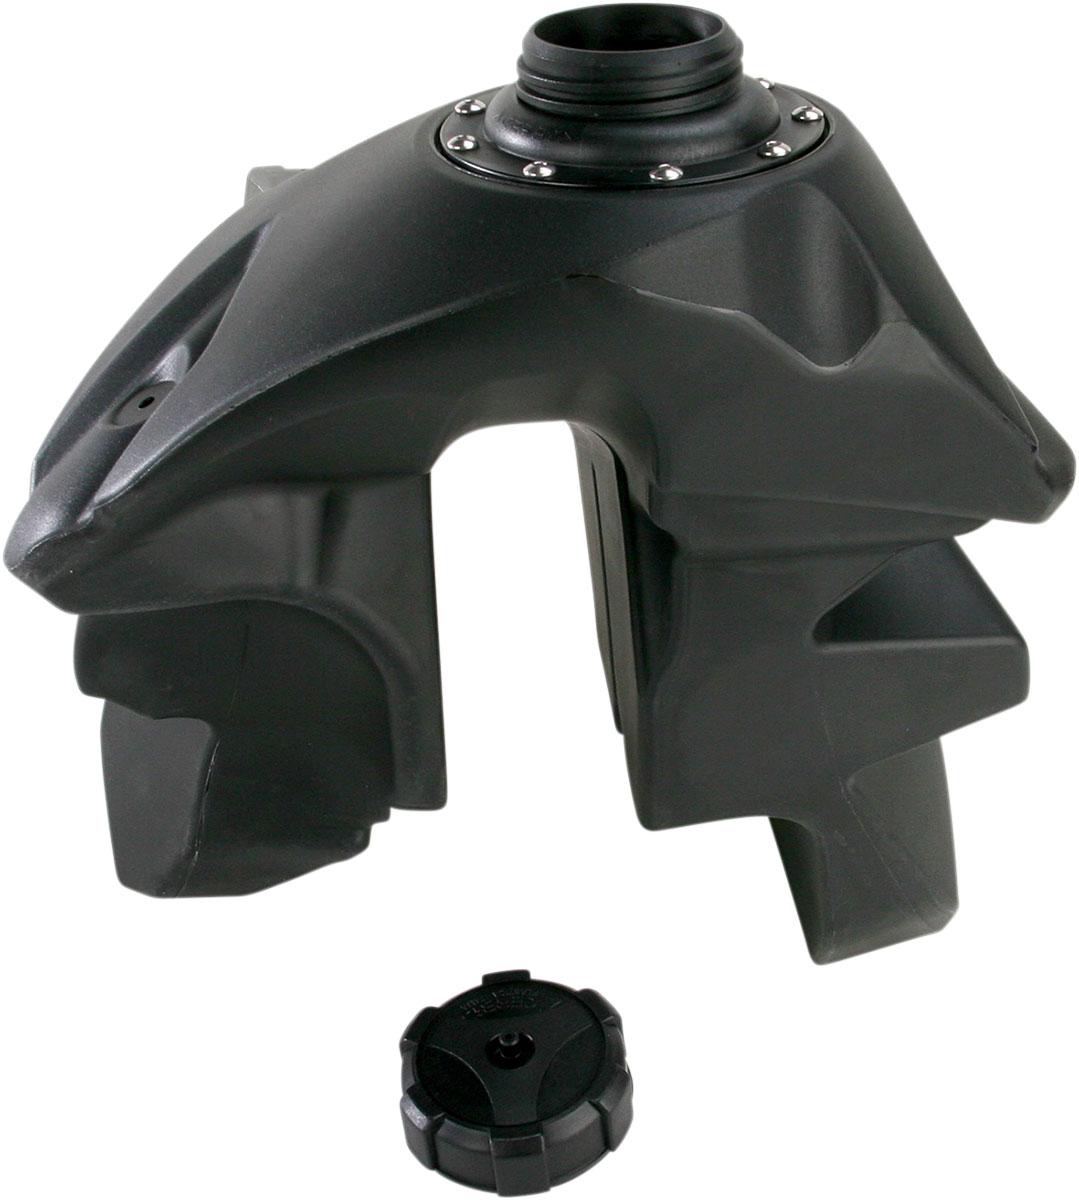 ACERBIS Large Capacity Fuel Tank 3.2 Gallon (Black)